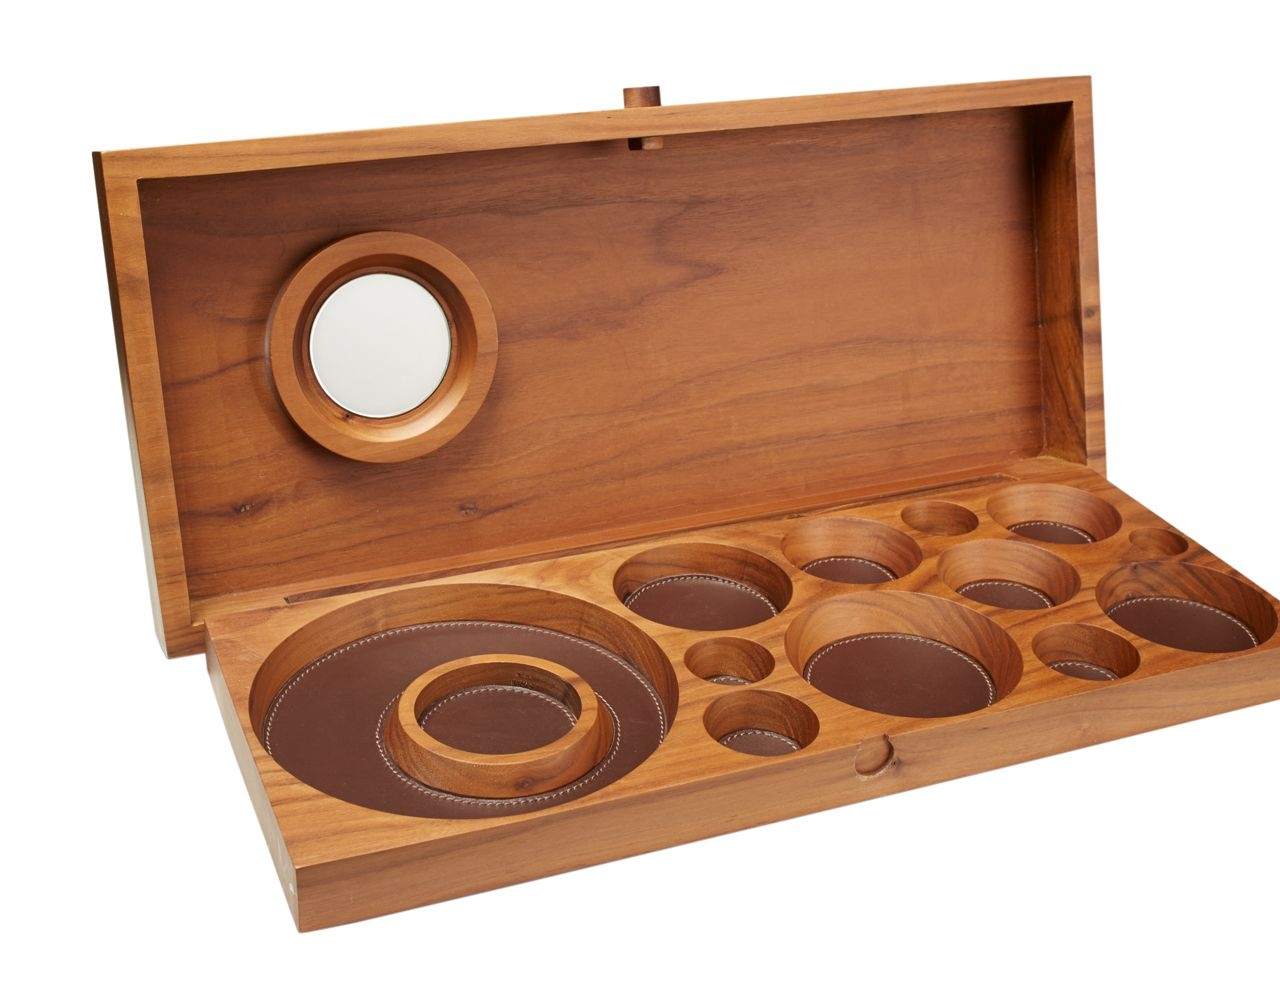 Girls Wooden Jewelry Box Foter